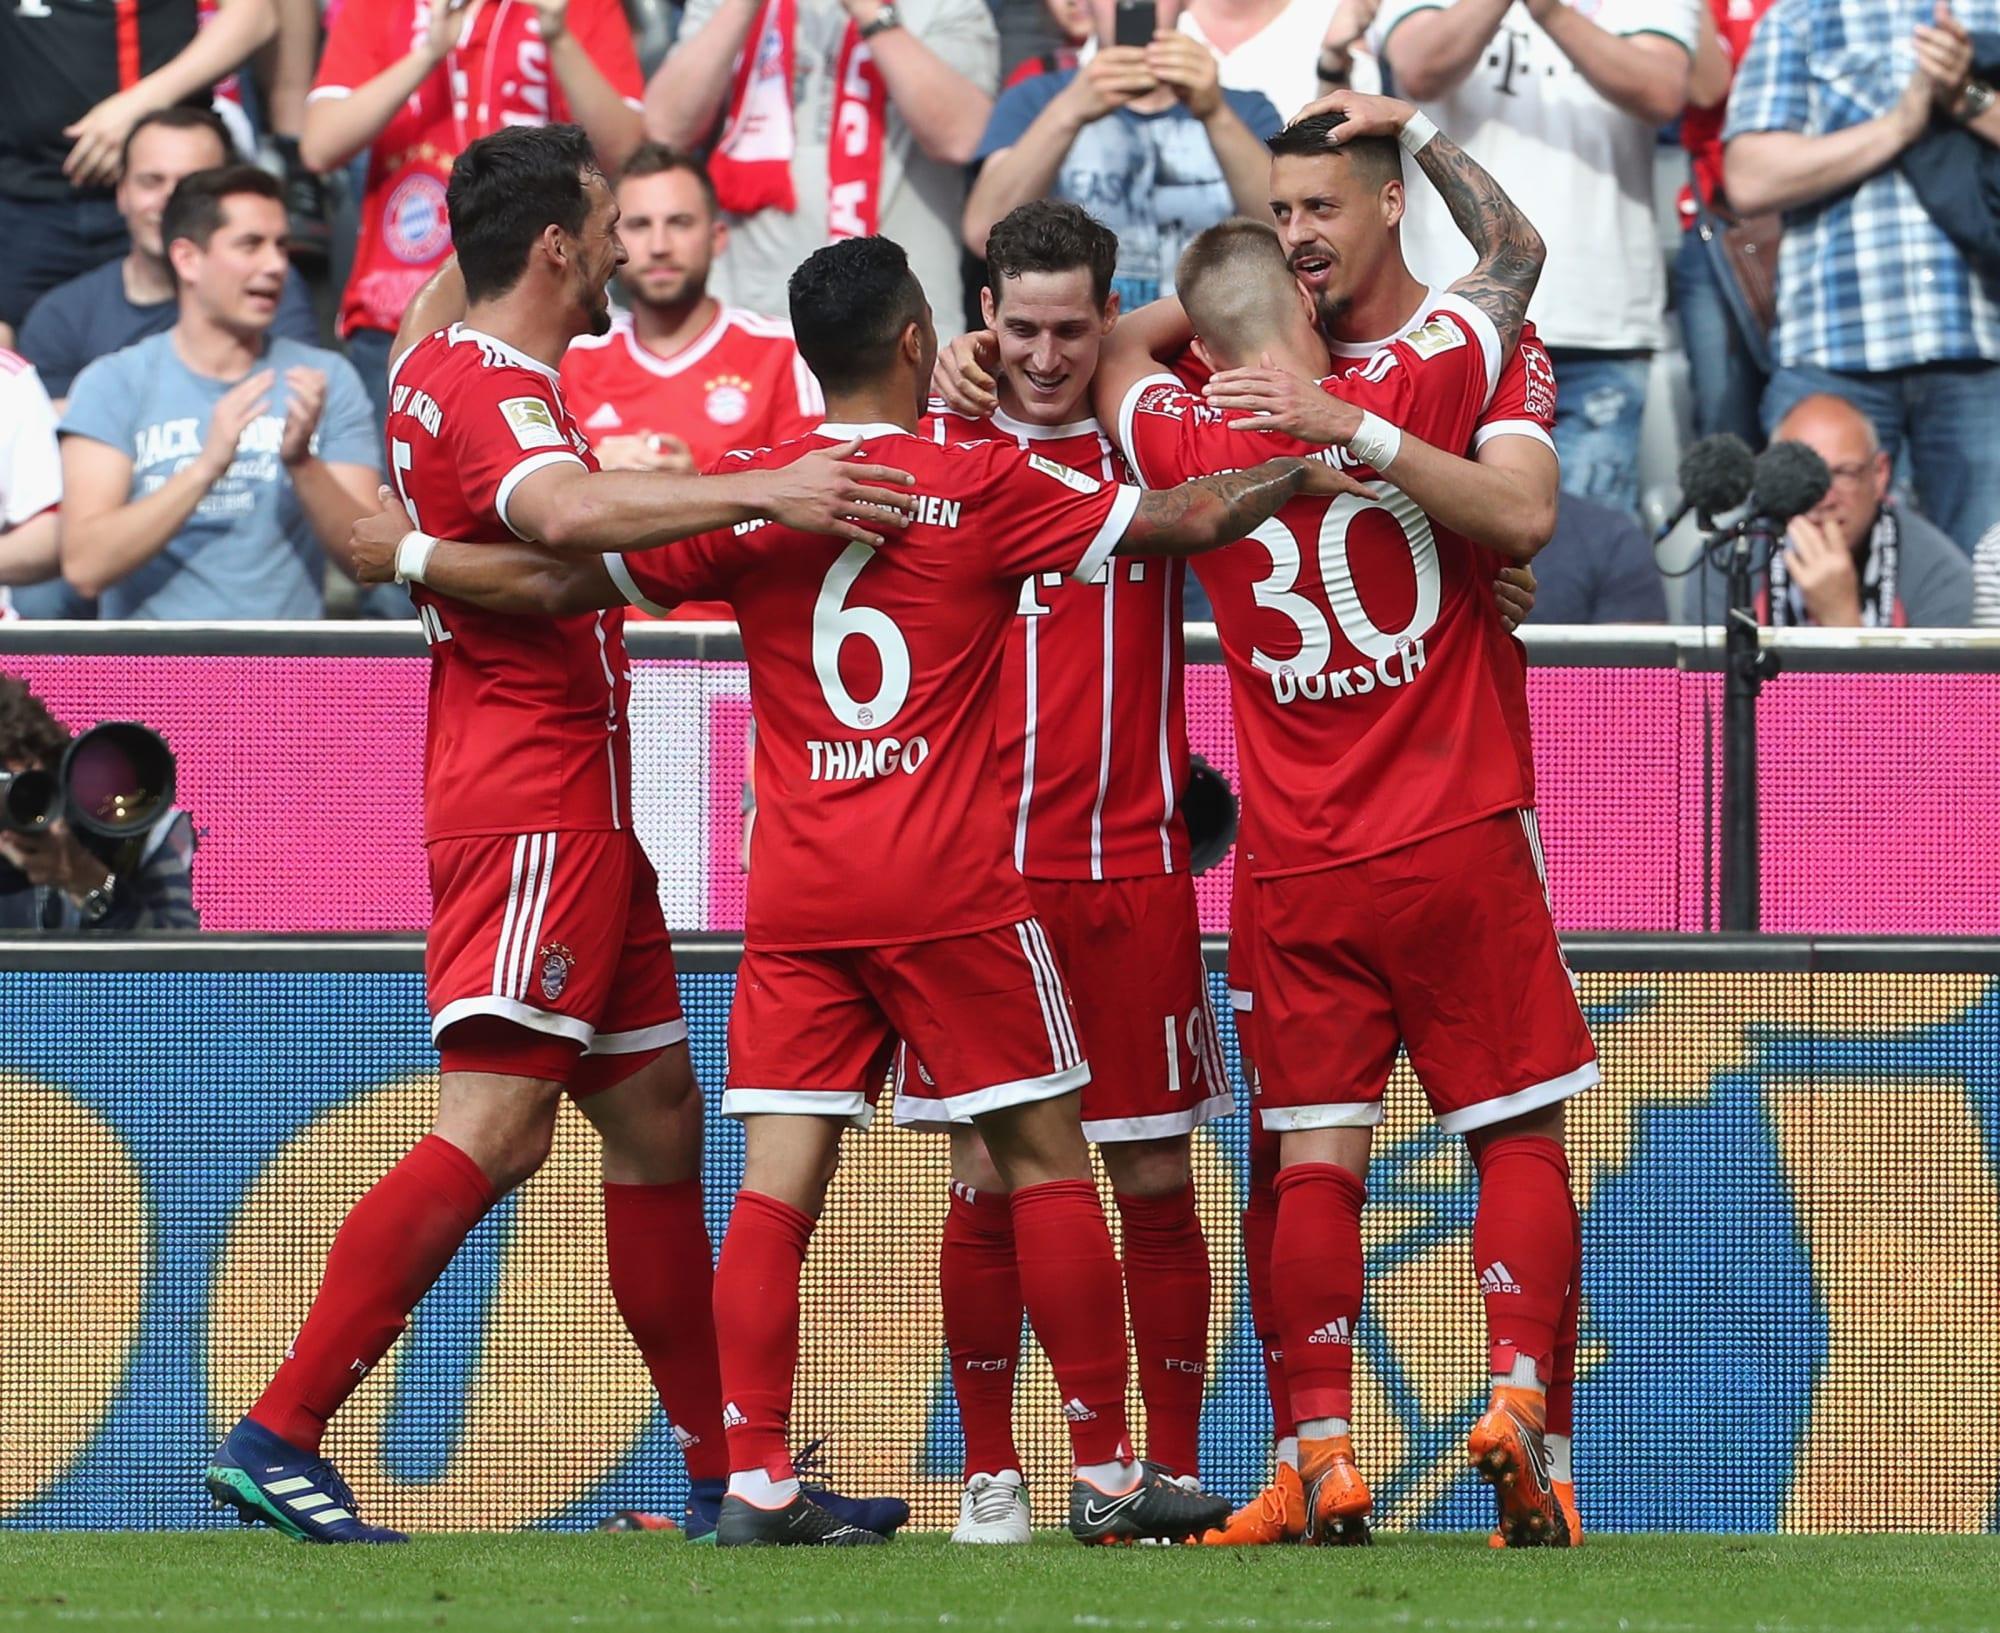 Bayern Frankfurt Tickets